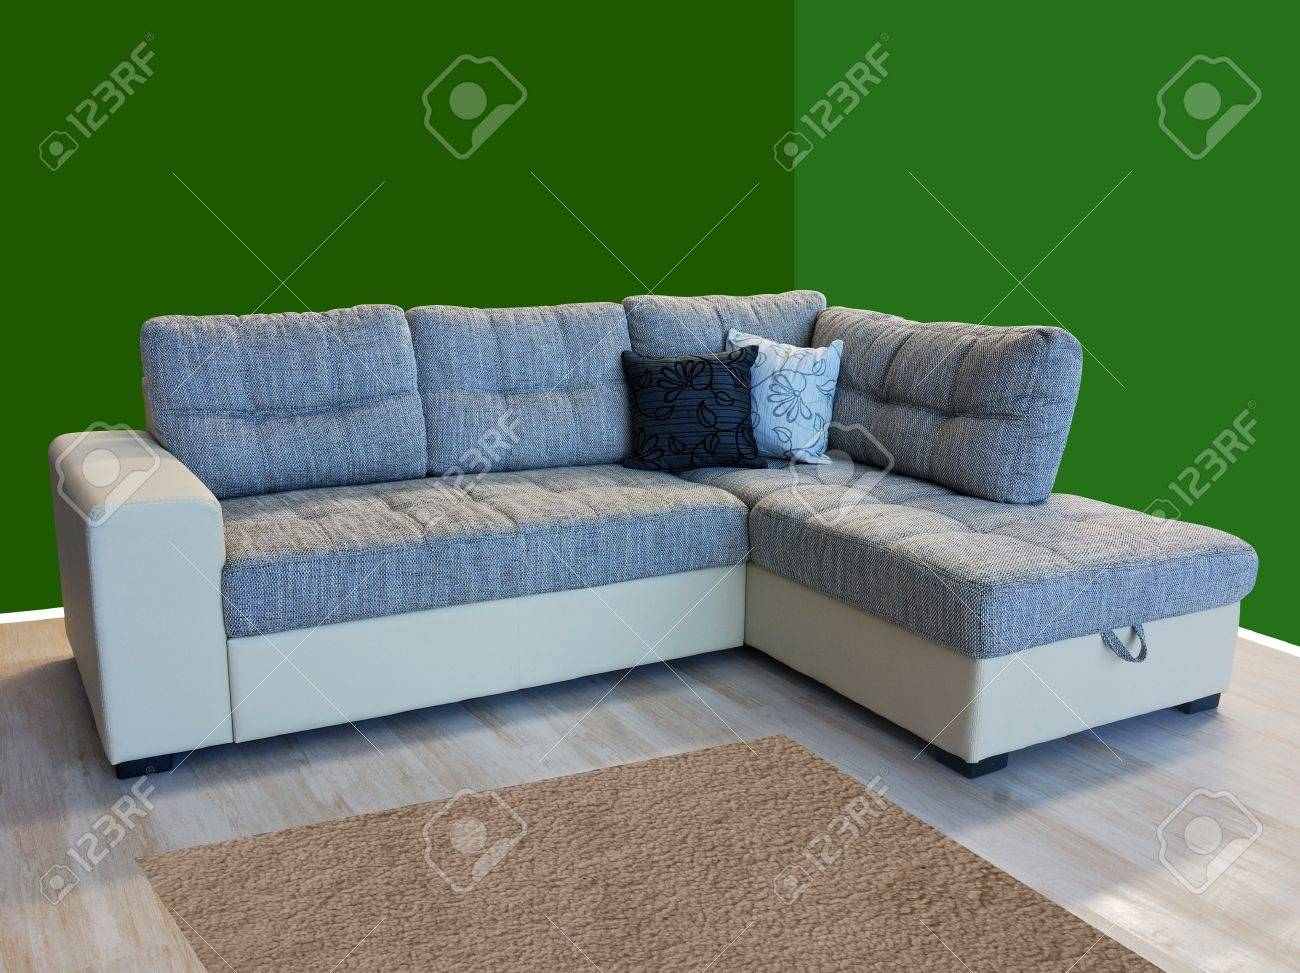 L shape fabric four sitter sofa Stock Photo - 10835916